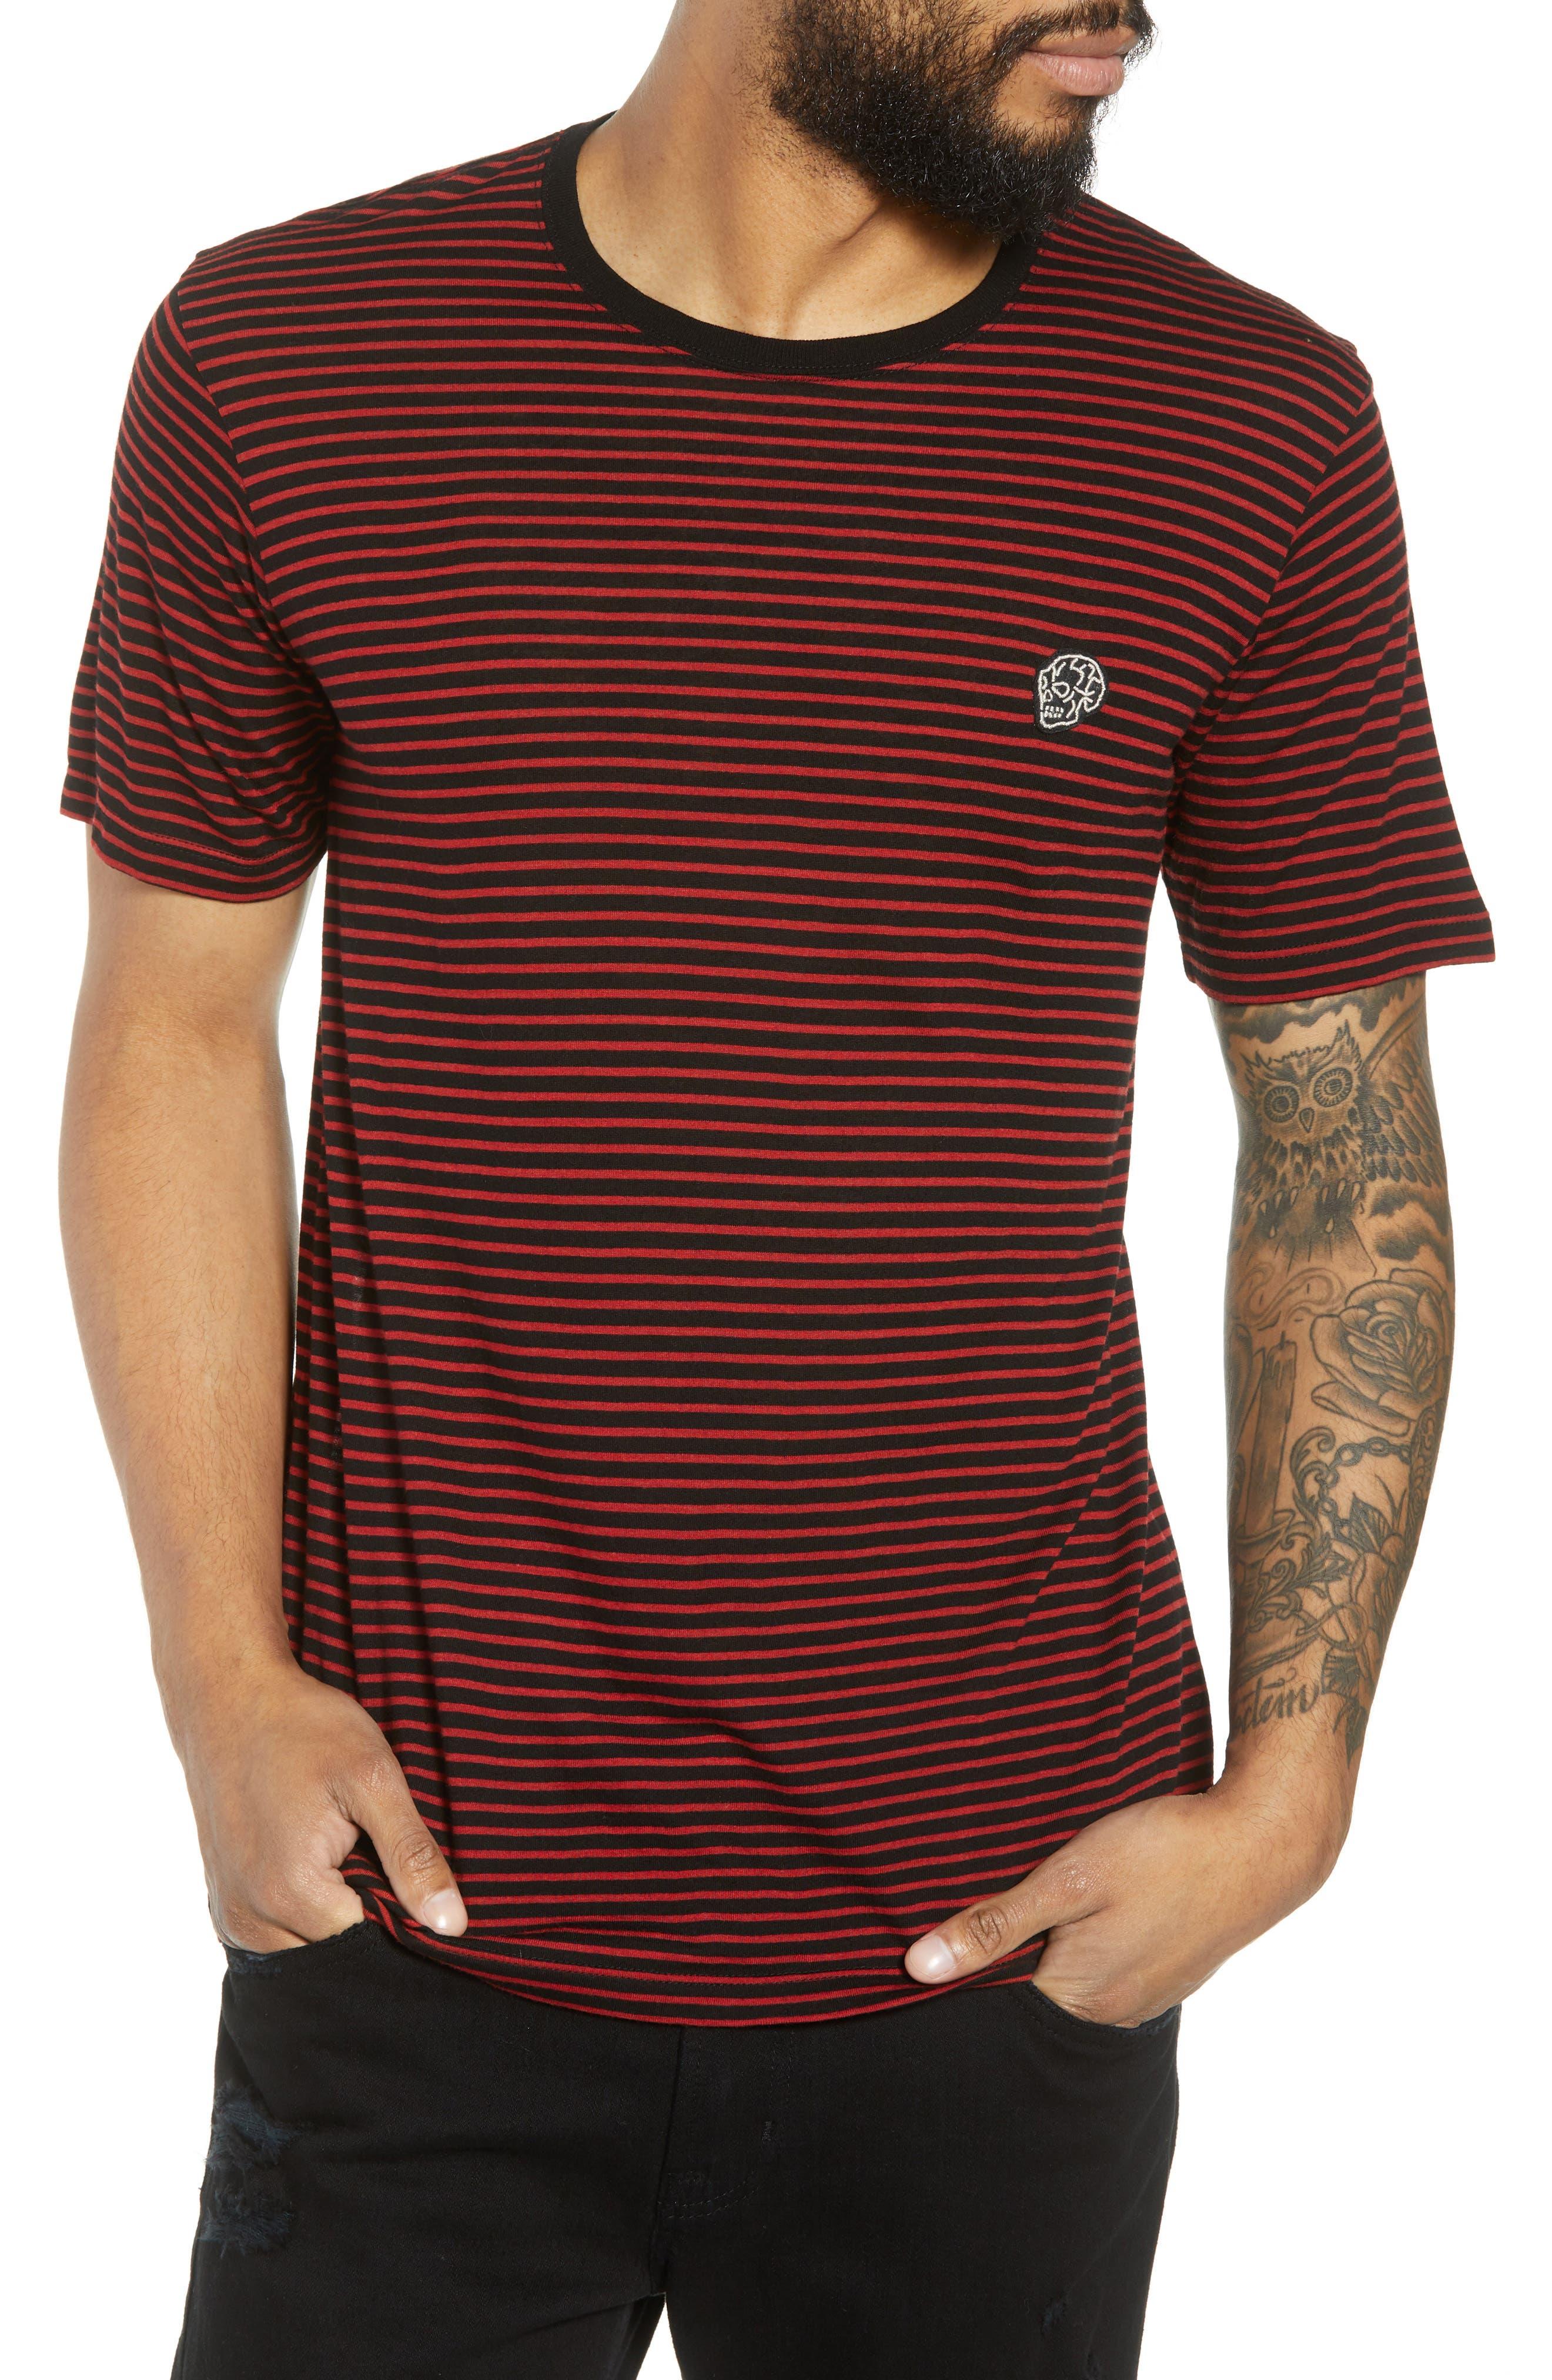 Skull Appliqué Striped Wool Blend T-Shirt, Main, color, 001